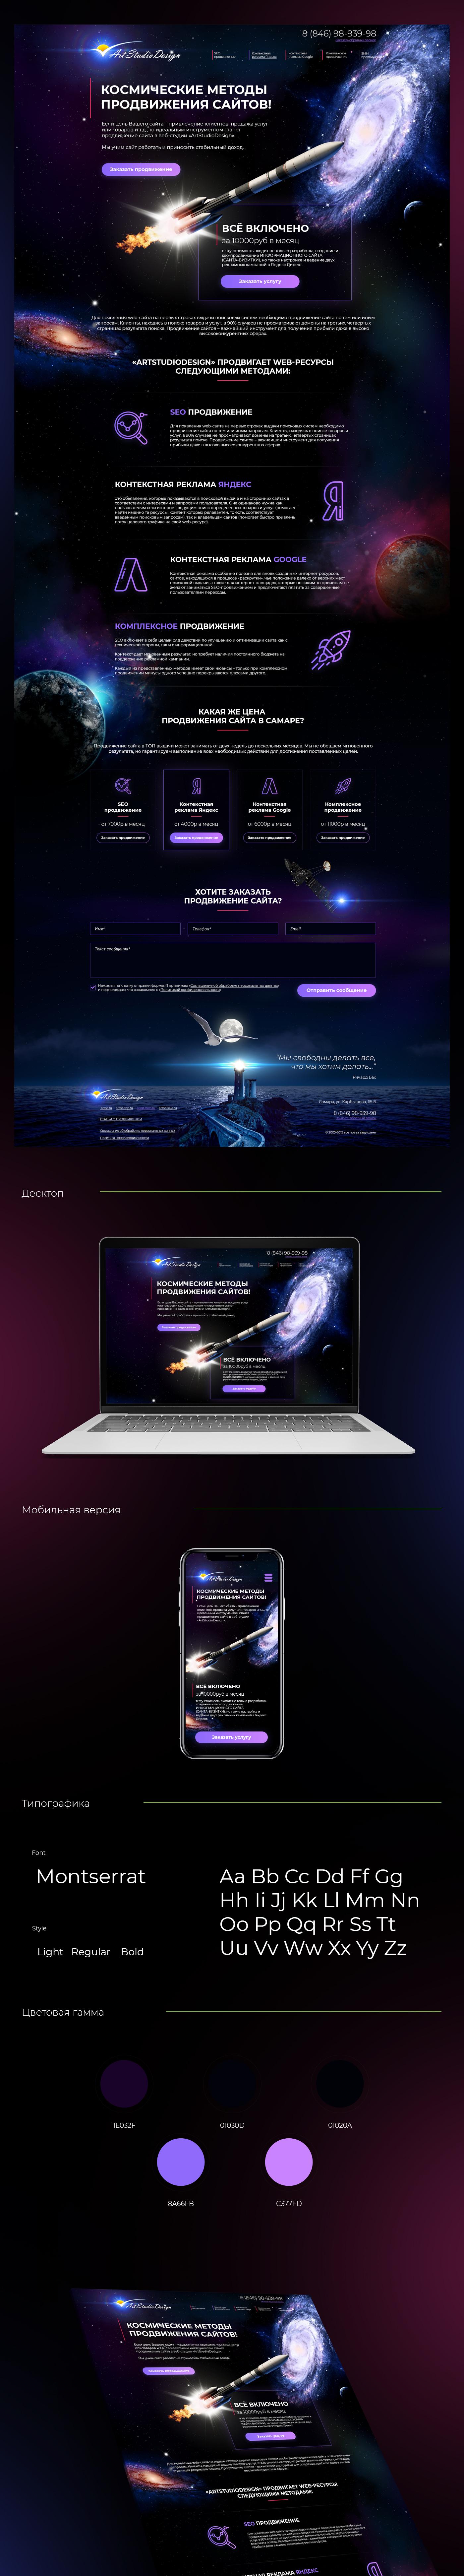 Веб-студия Арт Дизайн